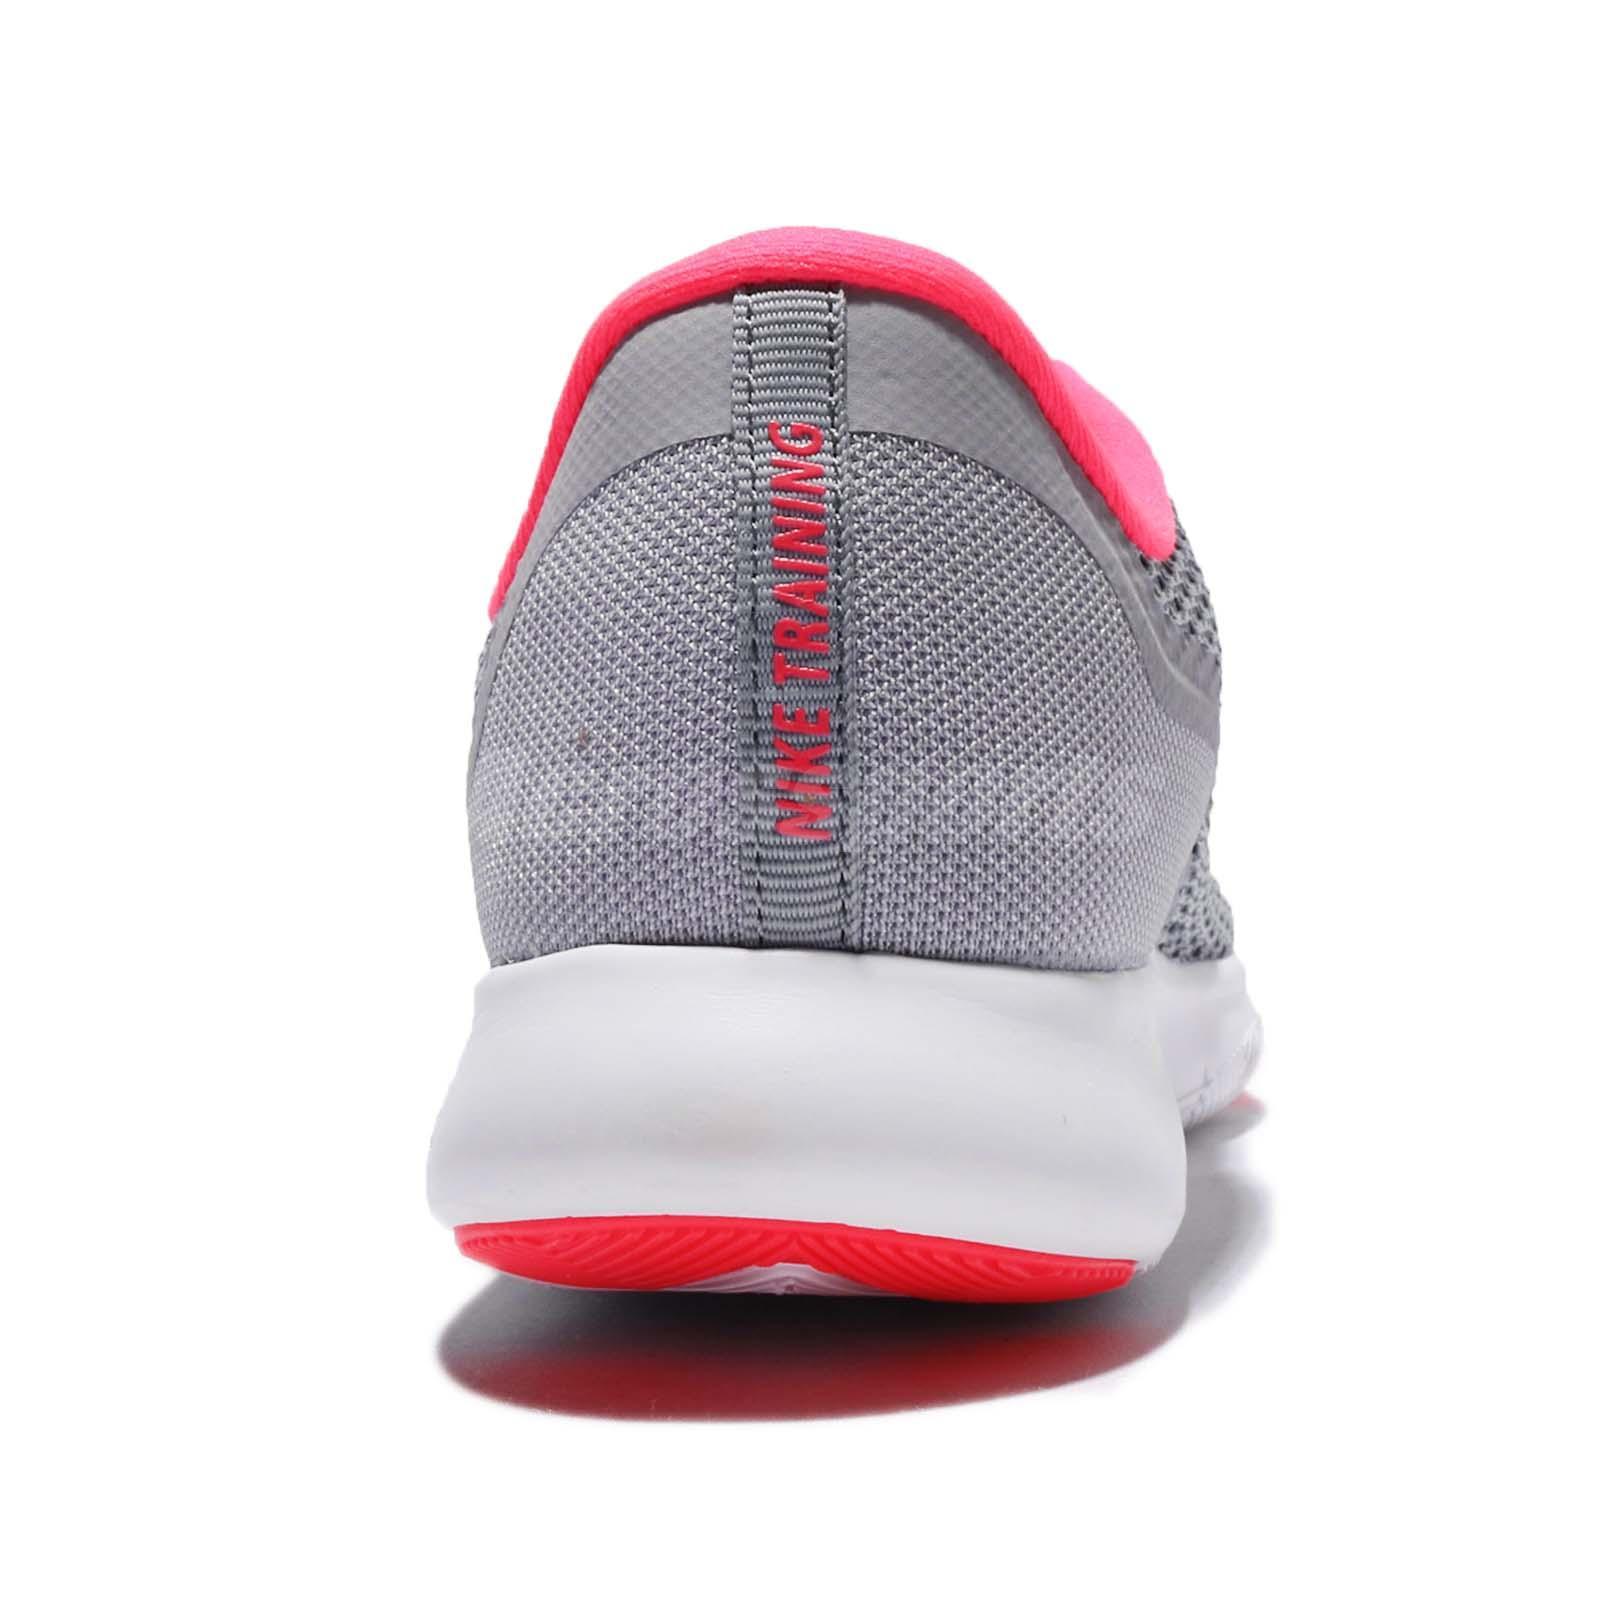 e7b190424d75 Nike Wmns Flex Trainer 7 VII Grey Pink Women Training Shoes Sneakers ...